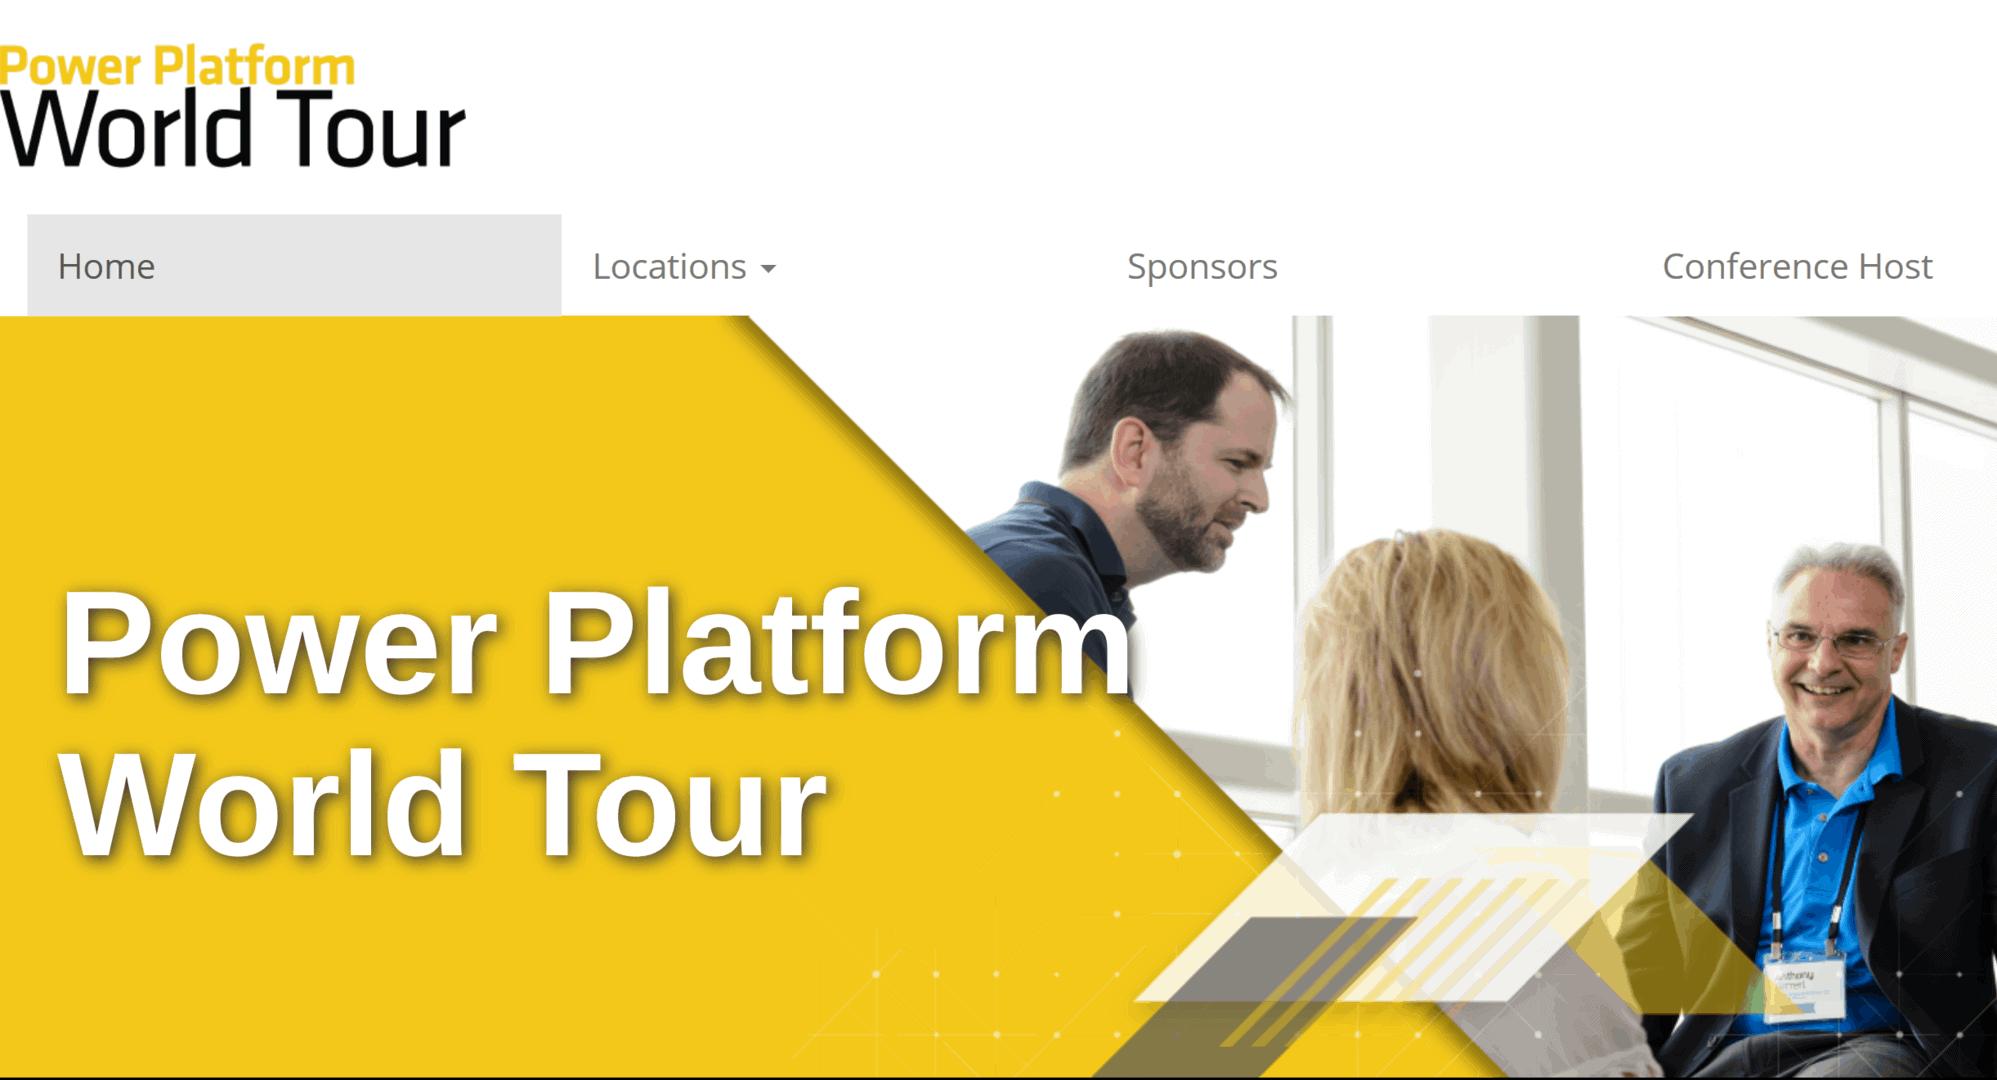 Power Platform World Tour